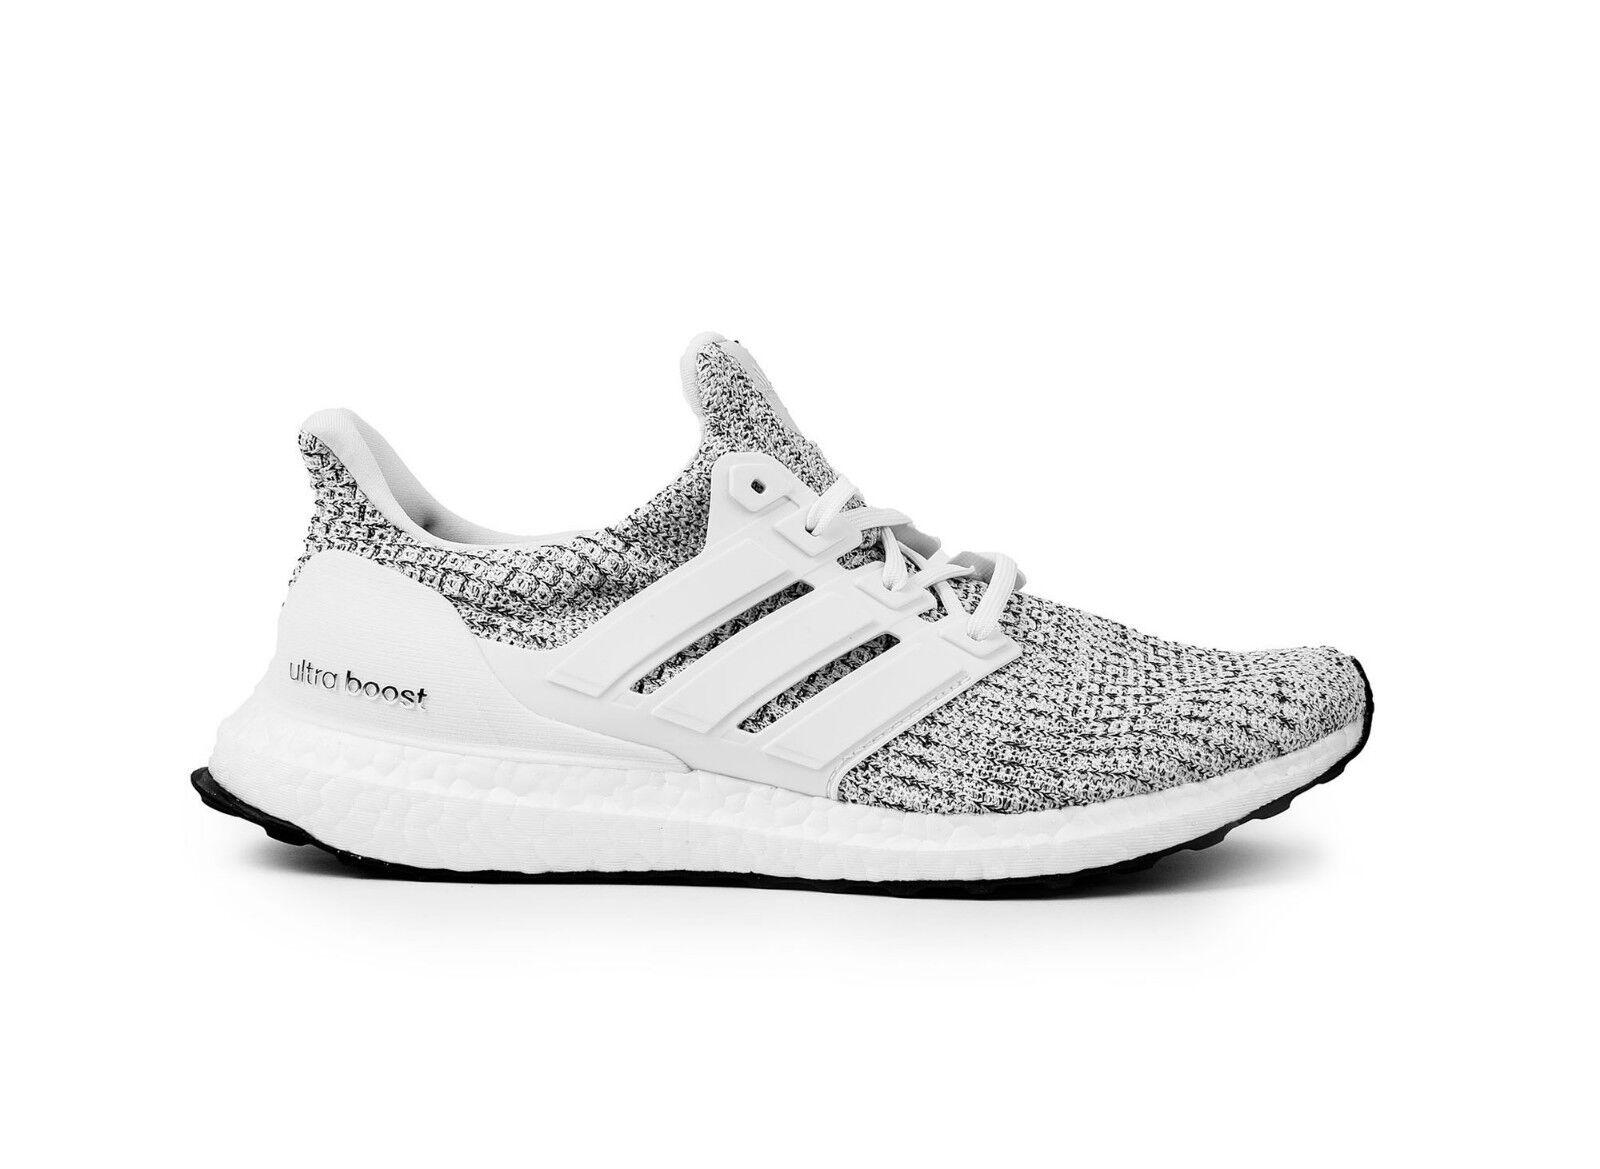 Adidas Schuhe Ultraboostf36155Running Trainers Training Stiefel dCsQxthr